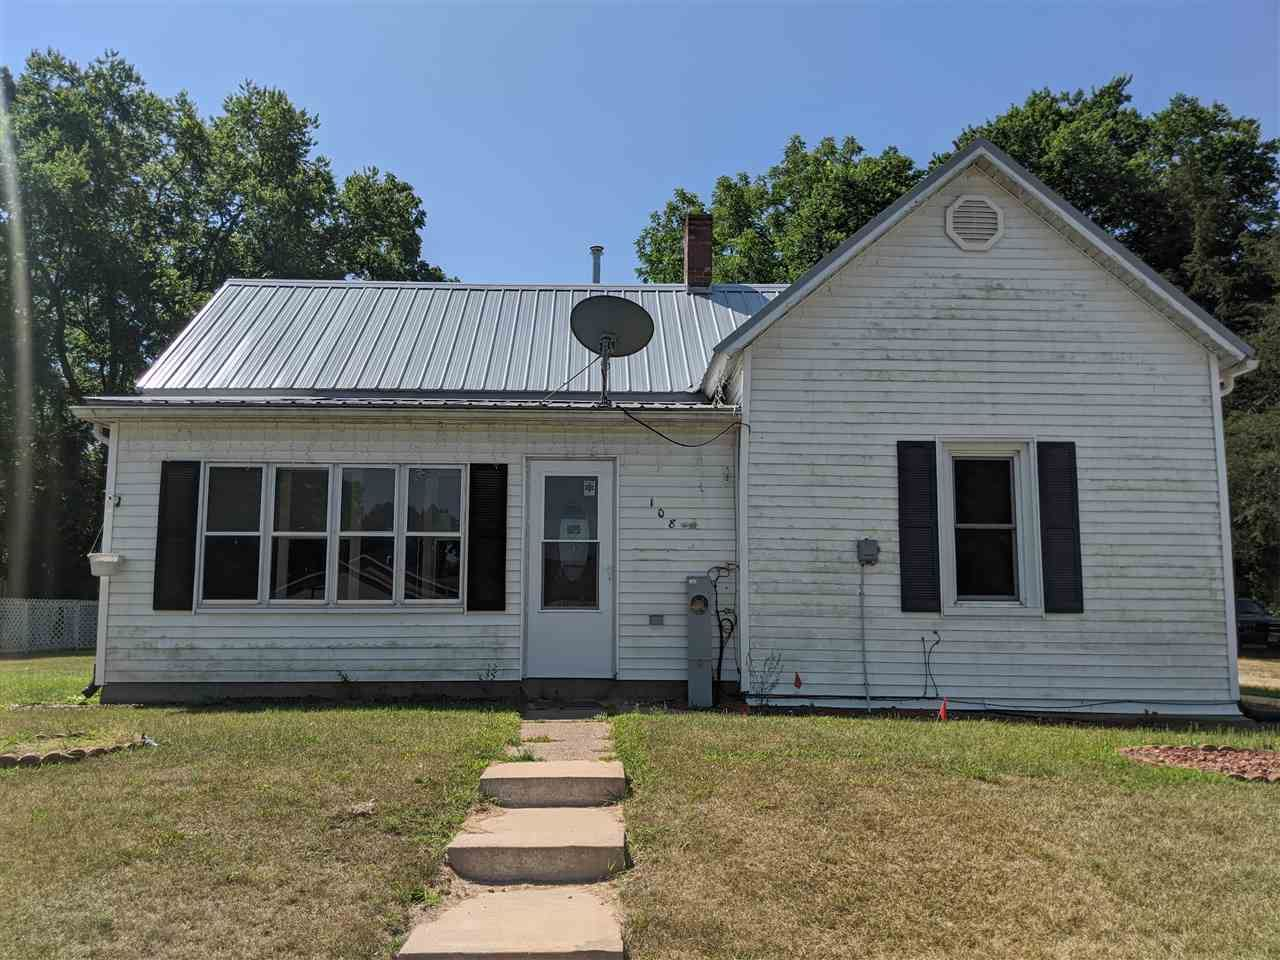 108 E Prairie St, Boscobel, WI 53805-1236 - #: 1881684